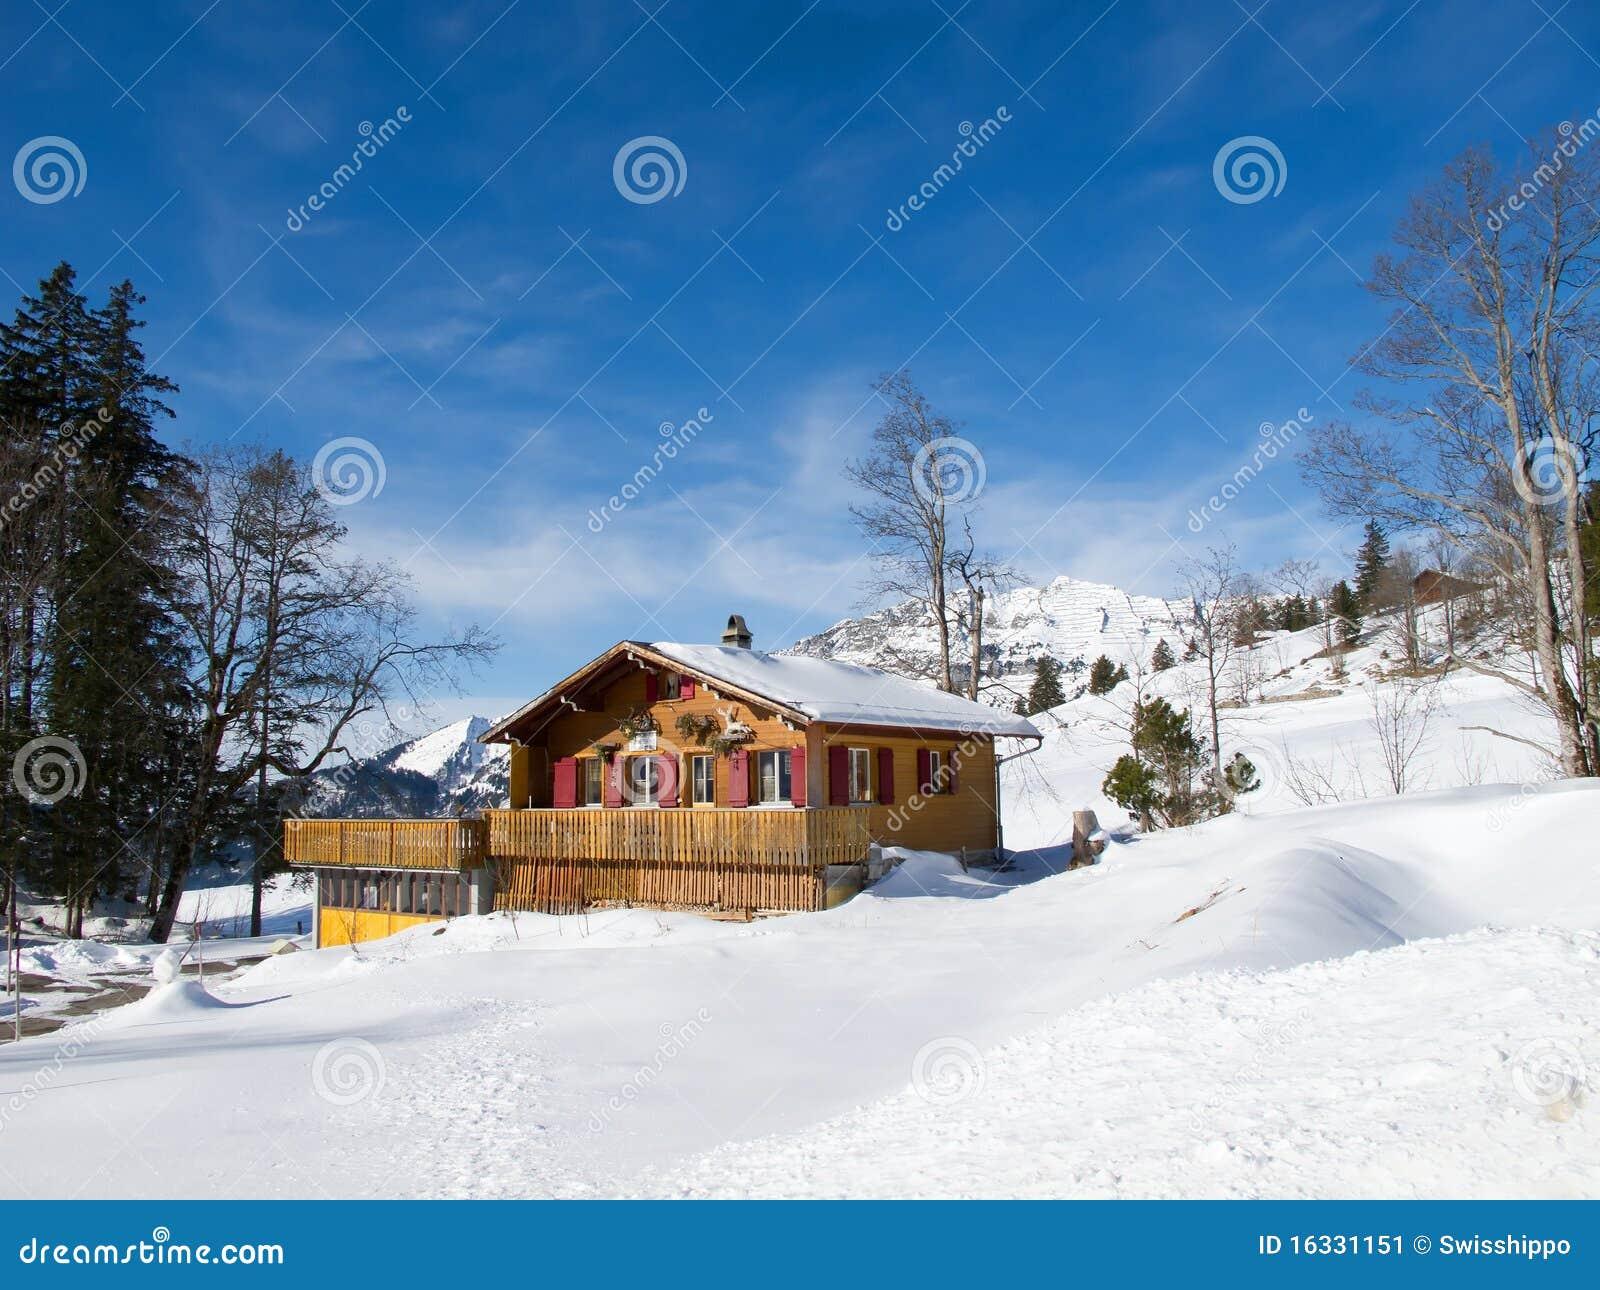 Winter Holiday House Stock Image Image 16331151